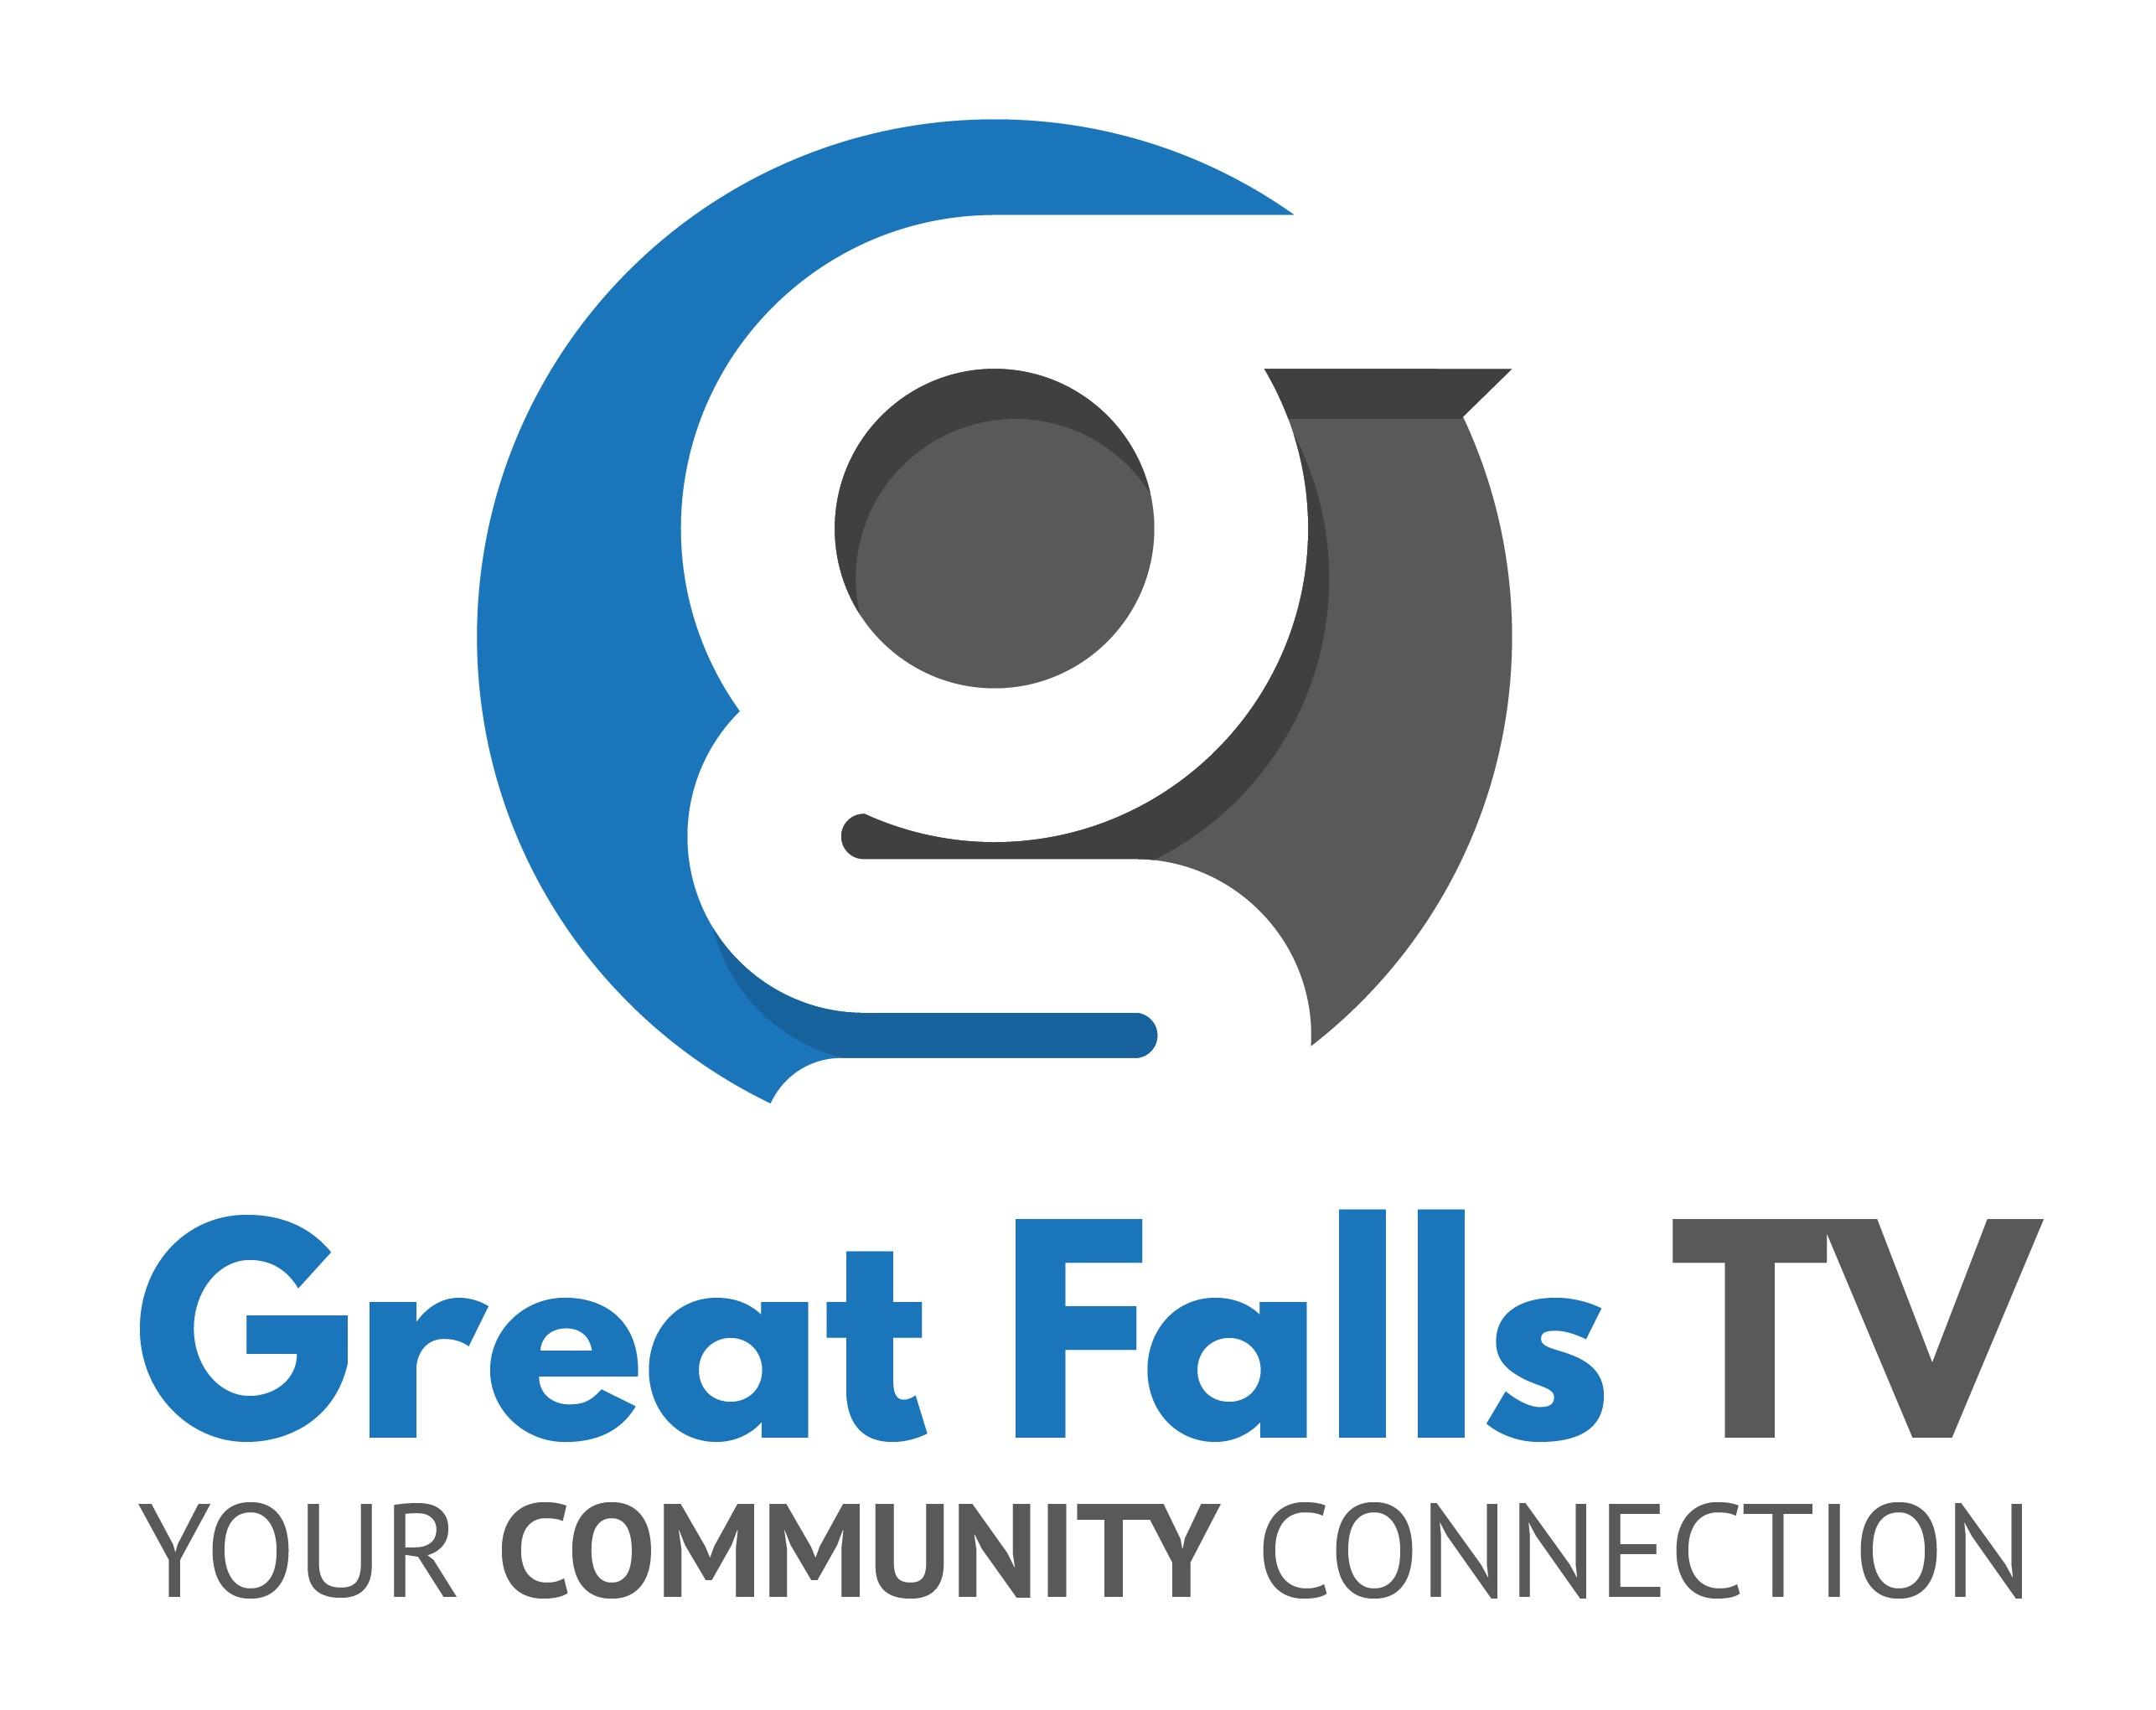 Great Falls TV